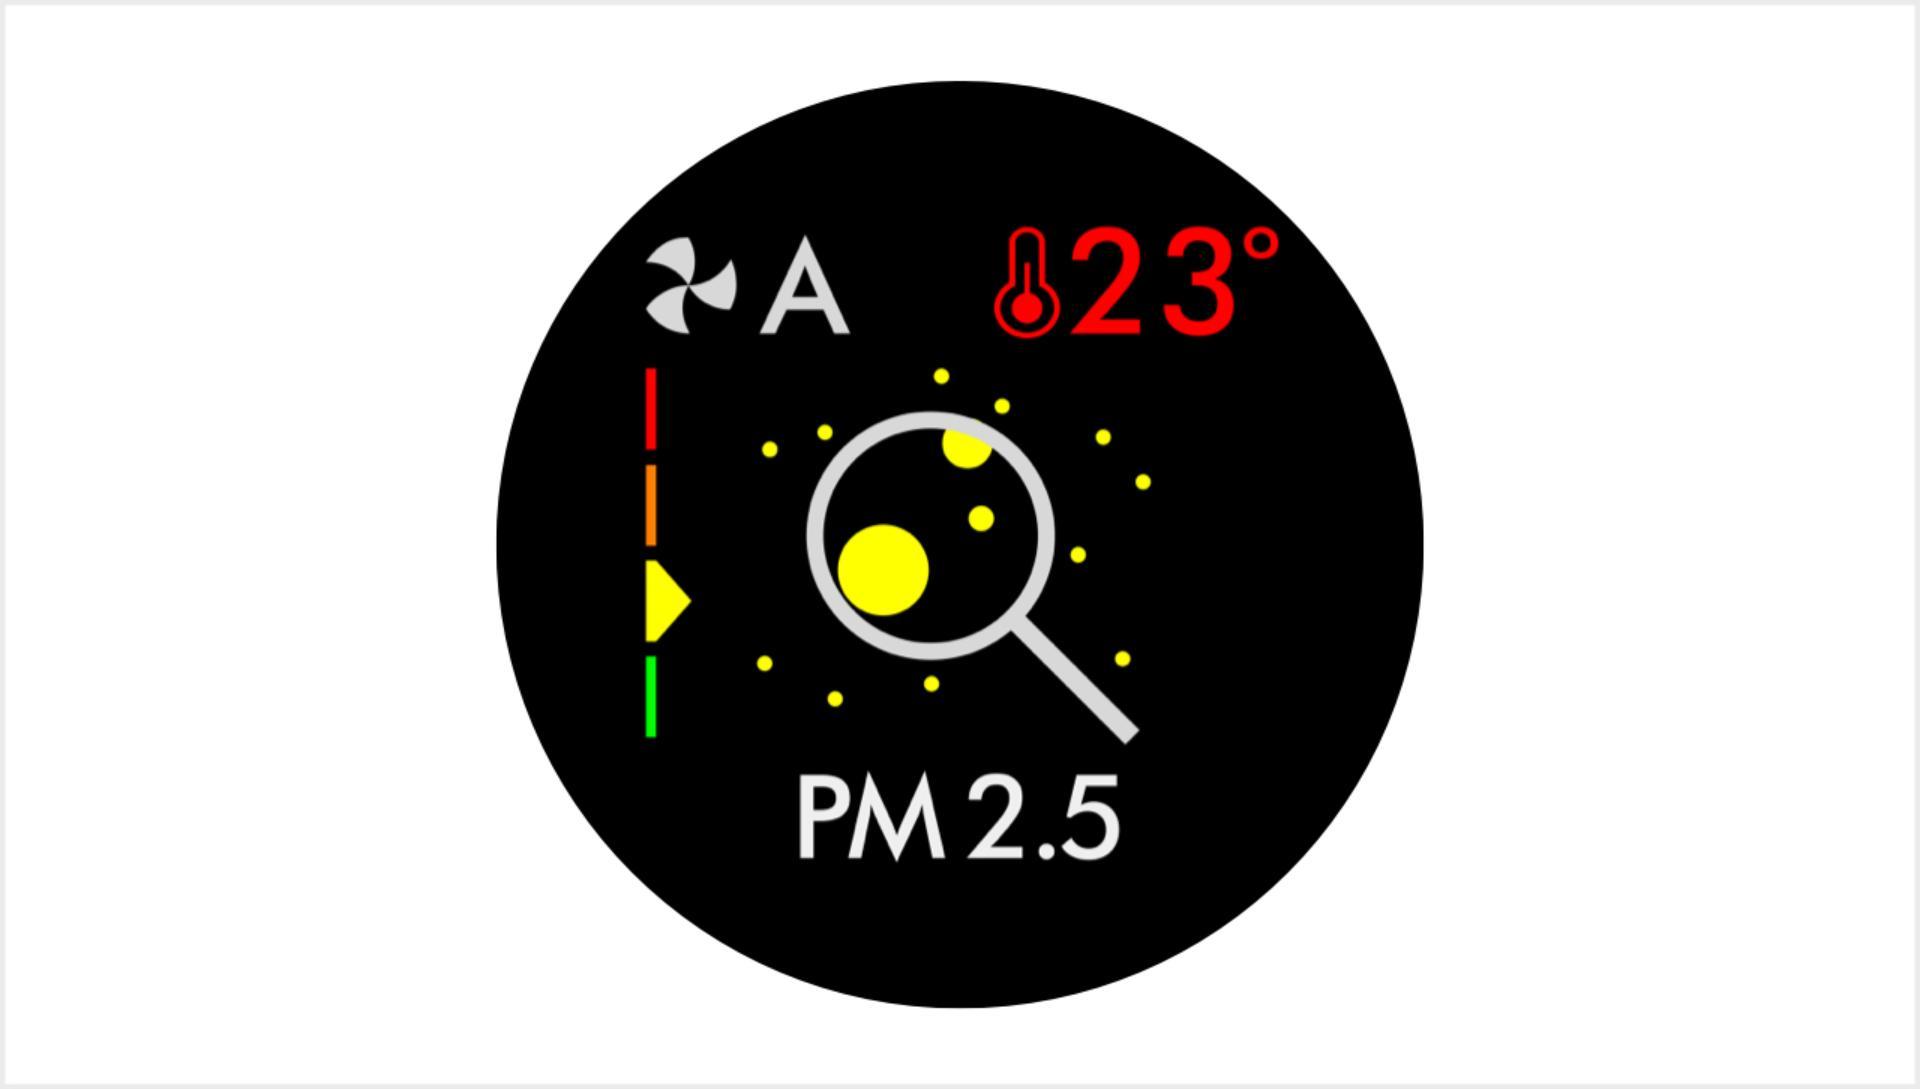 Particulate matter PM2.5 screen